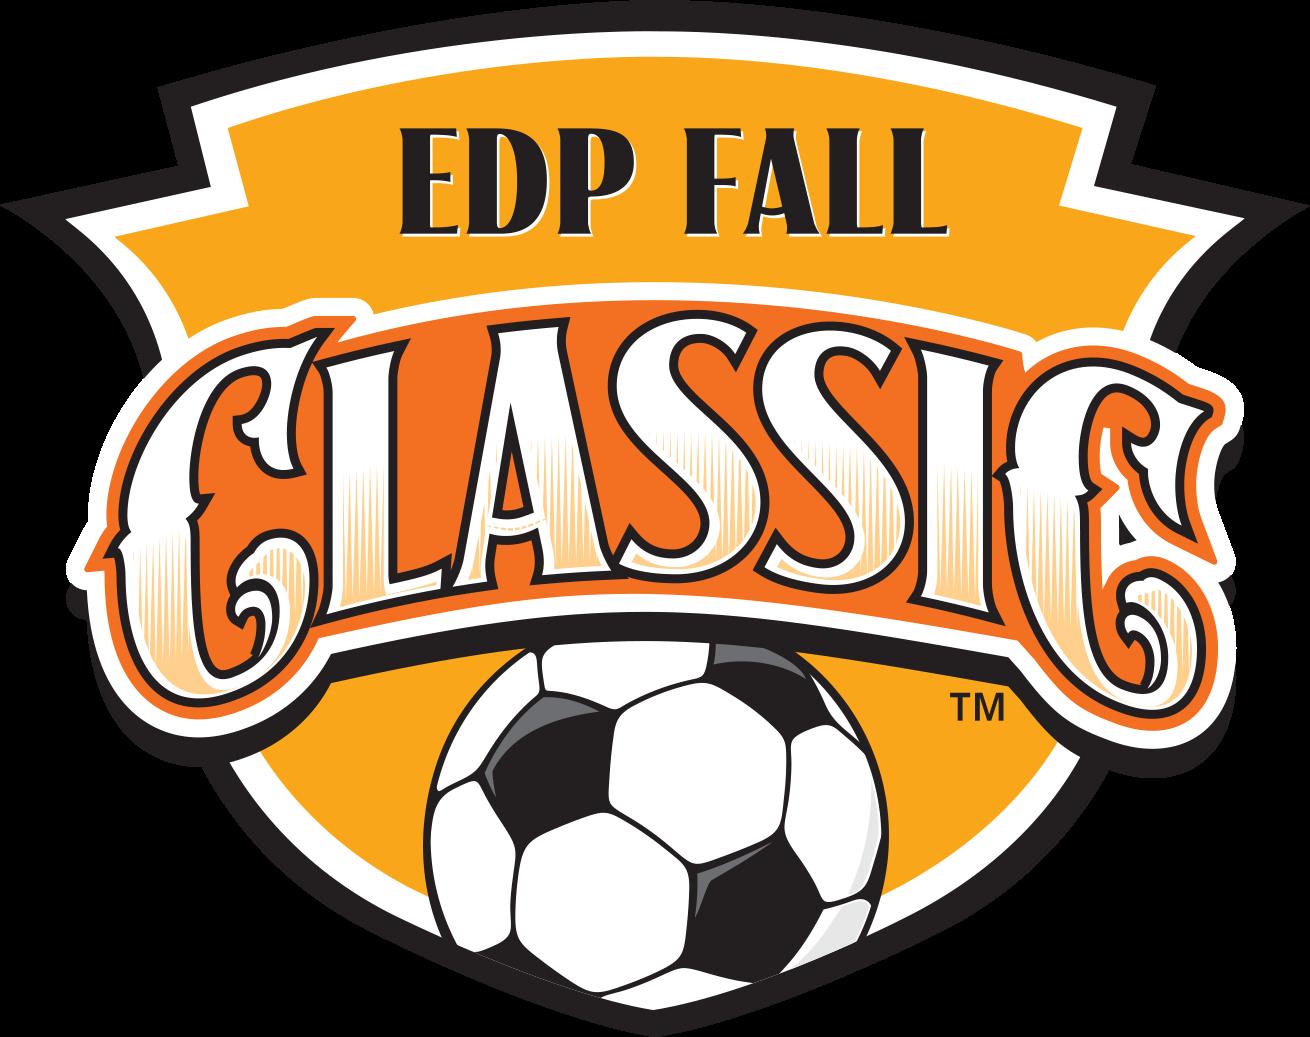 EDP Fall Classic